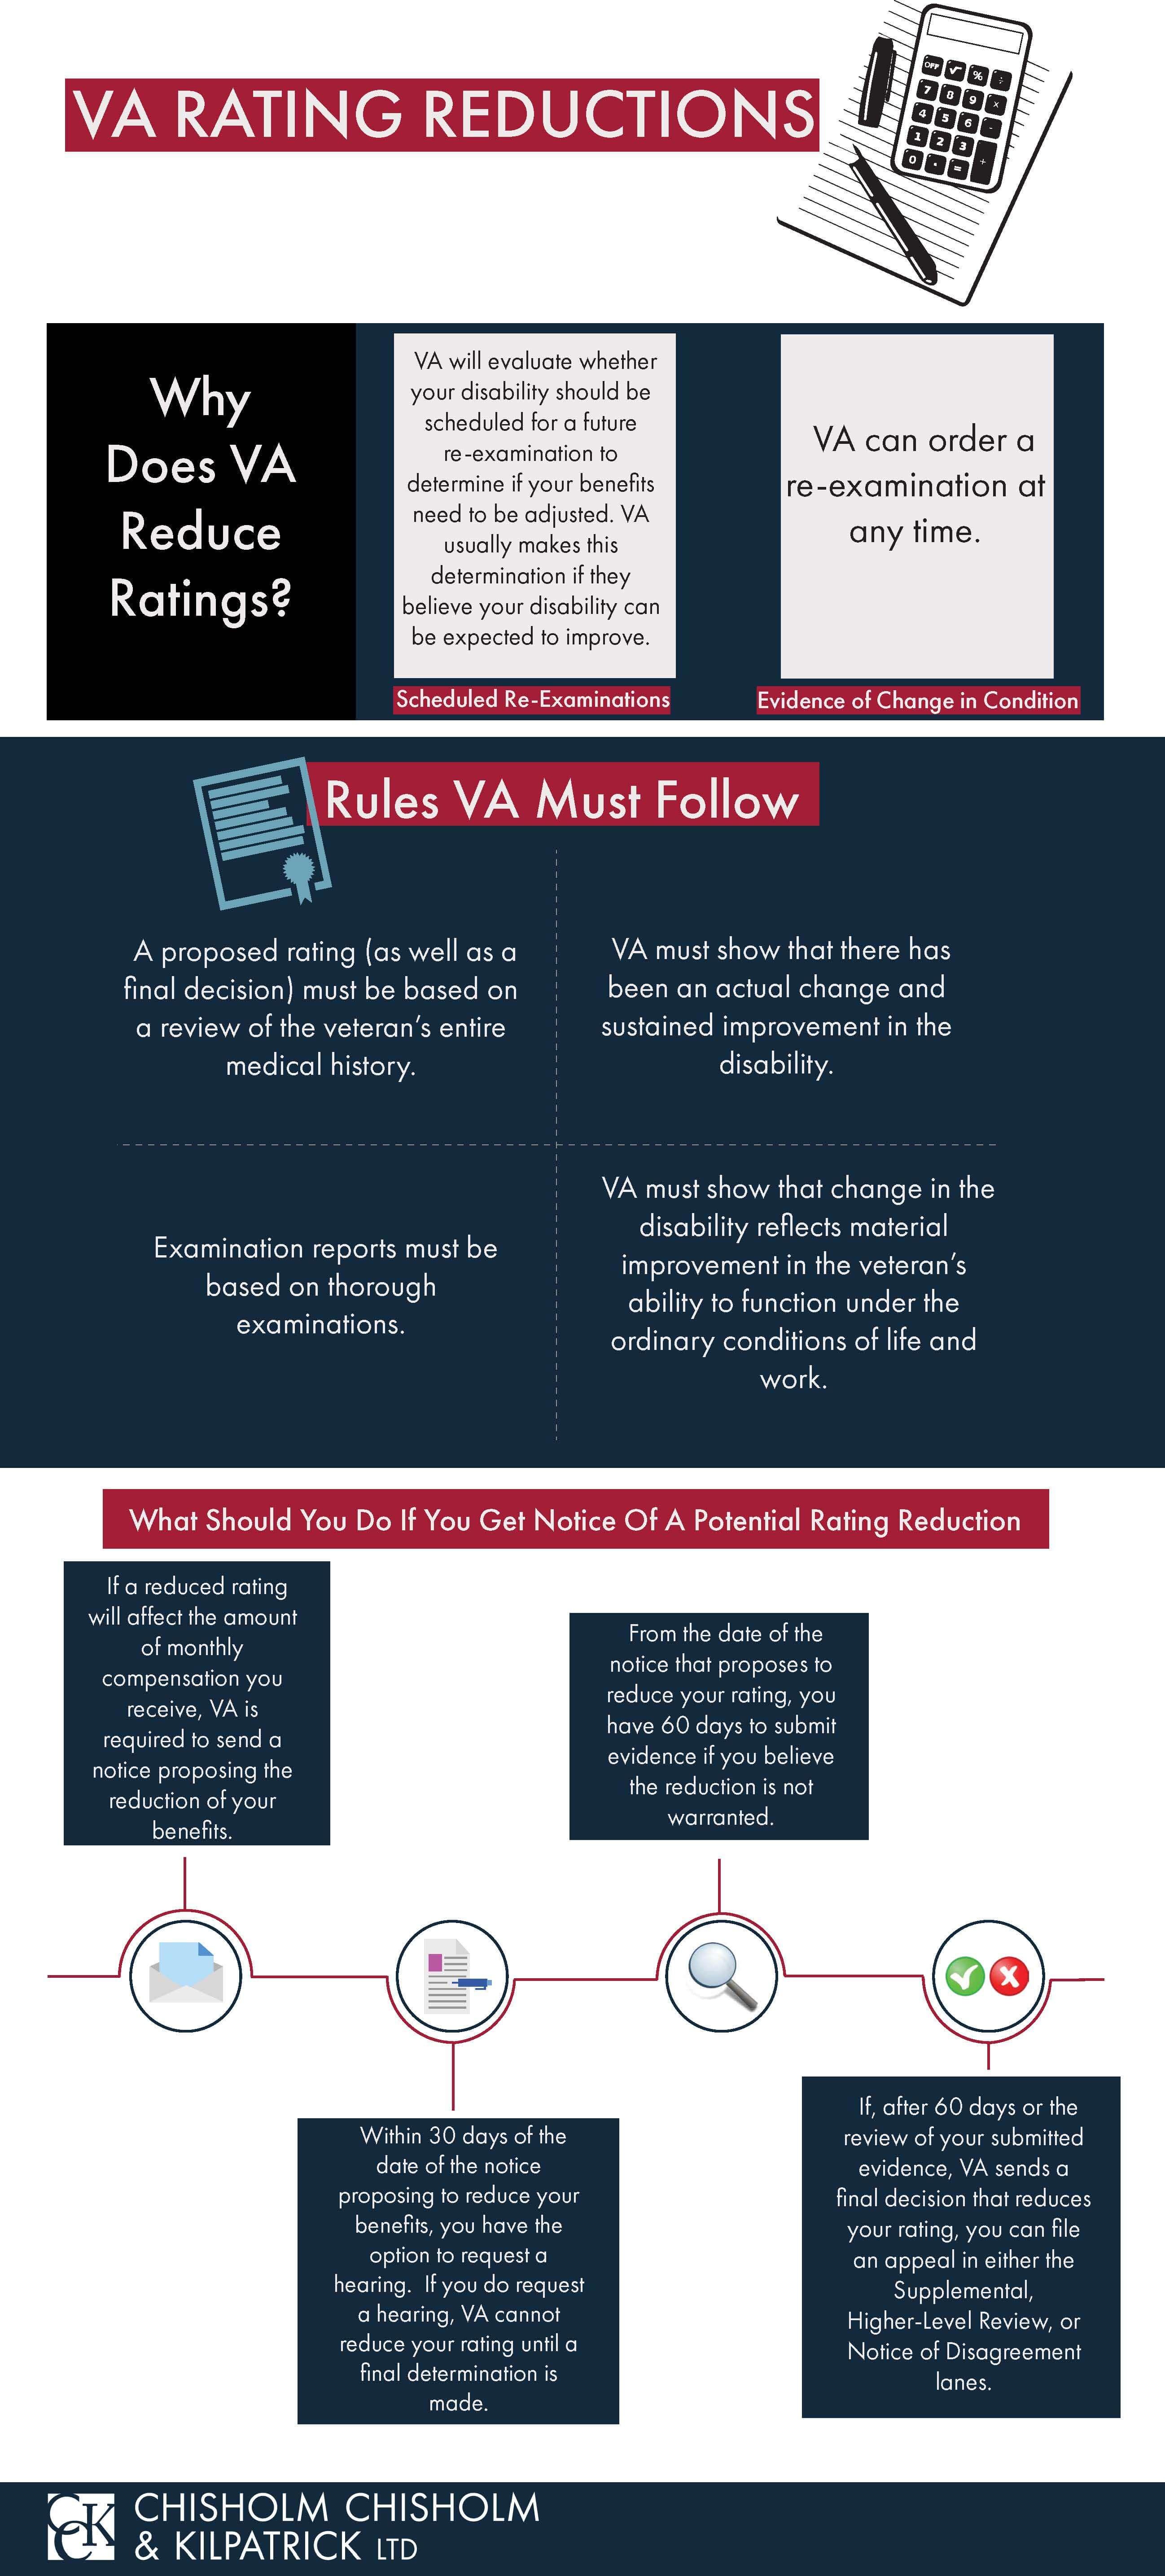 VA Rating Reductions Infographic